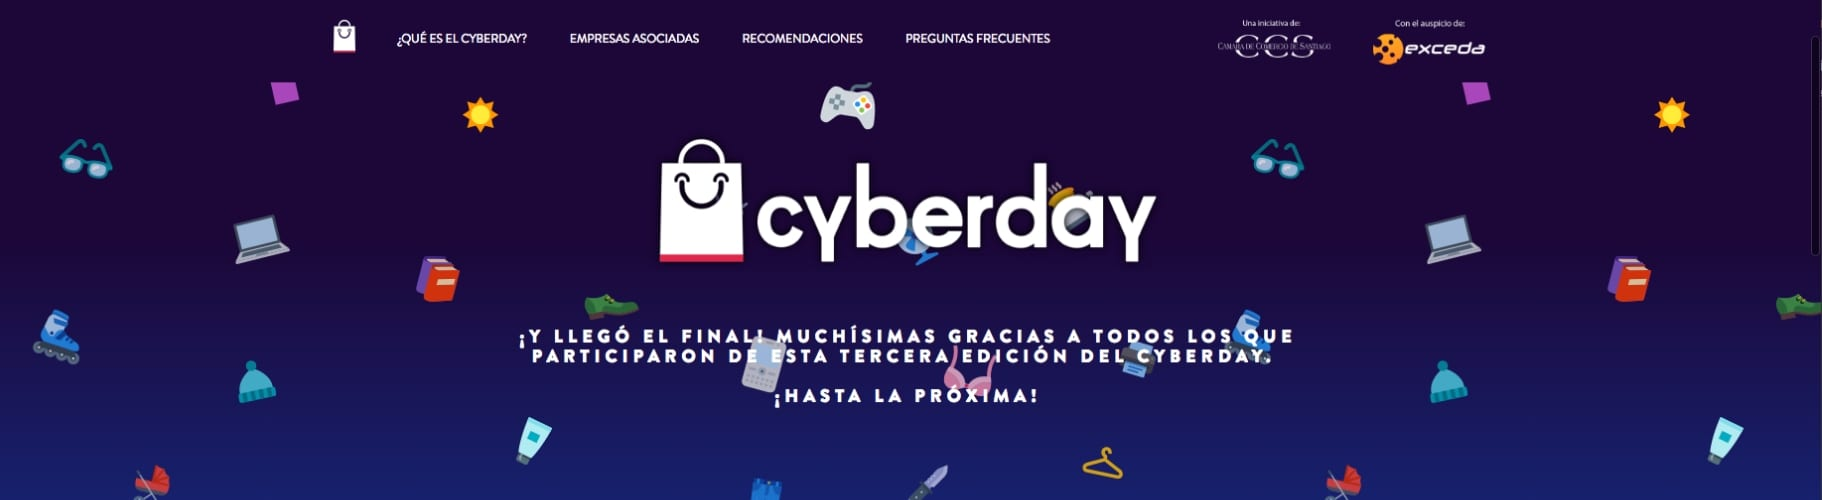 Cibermonday 6